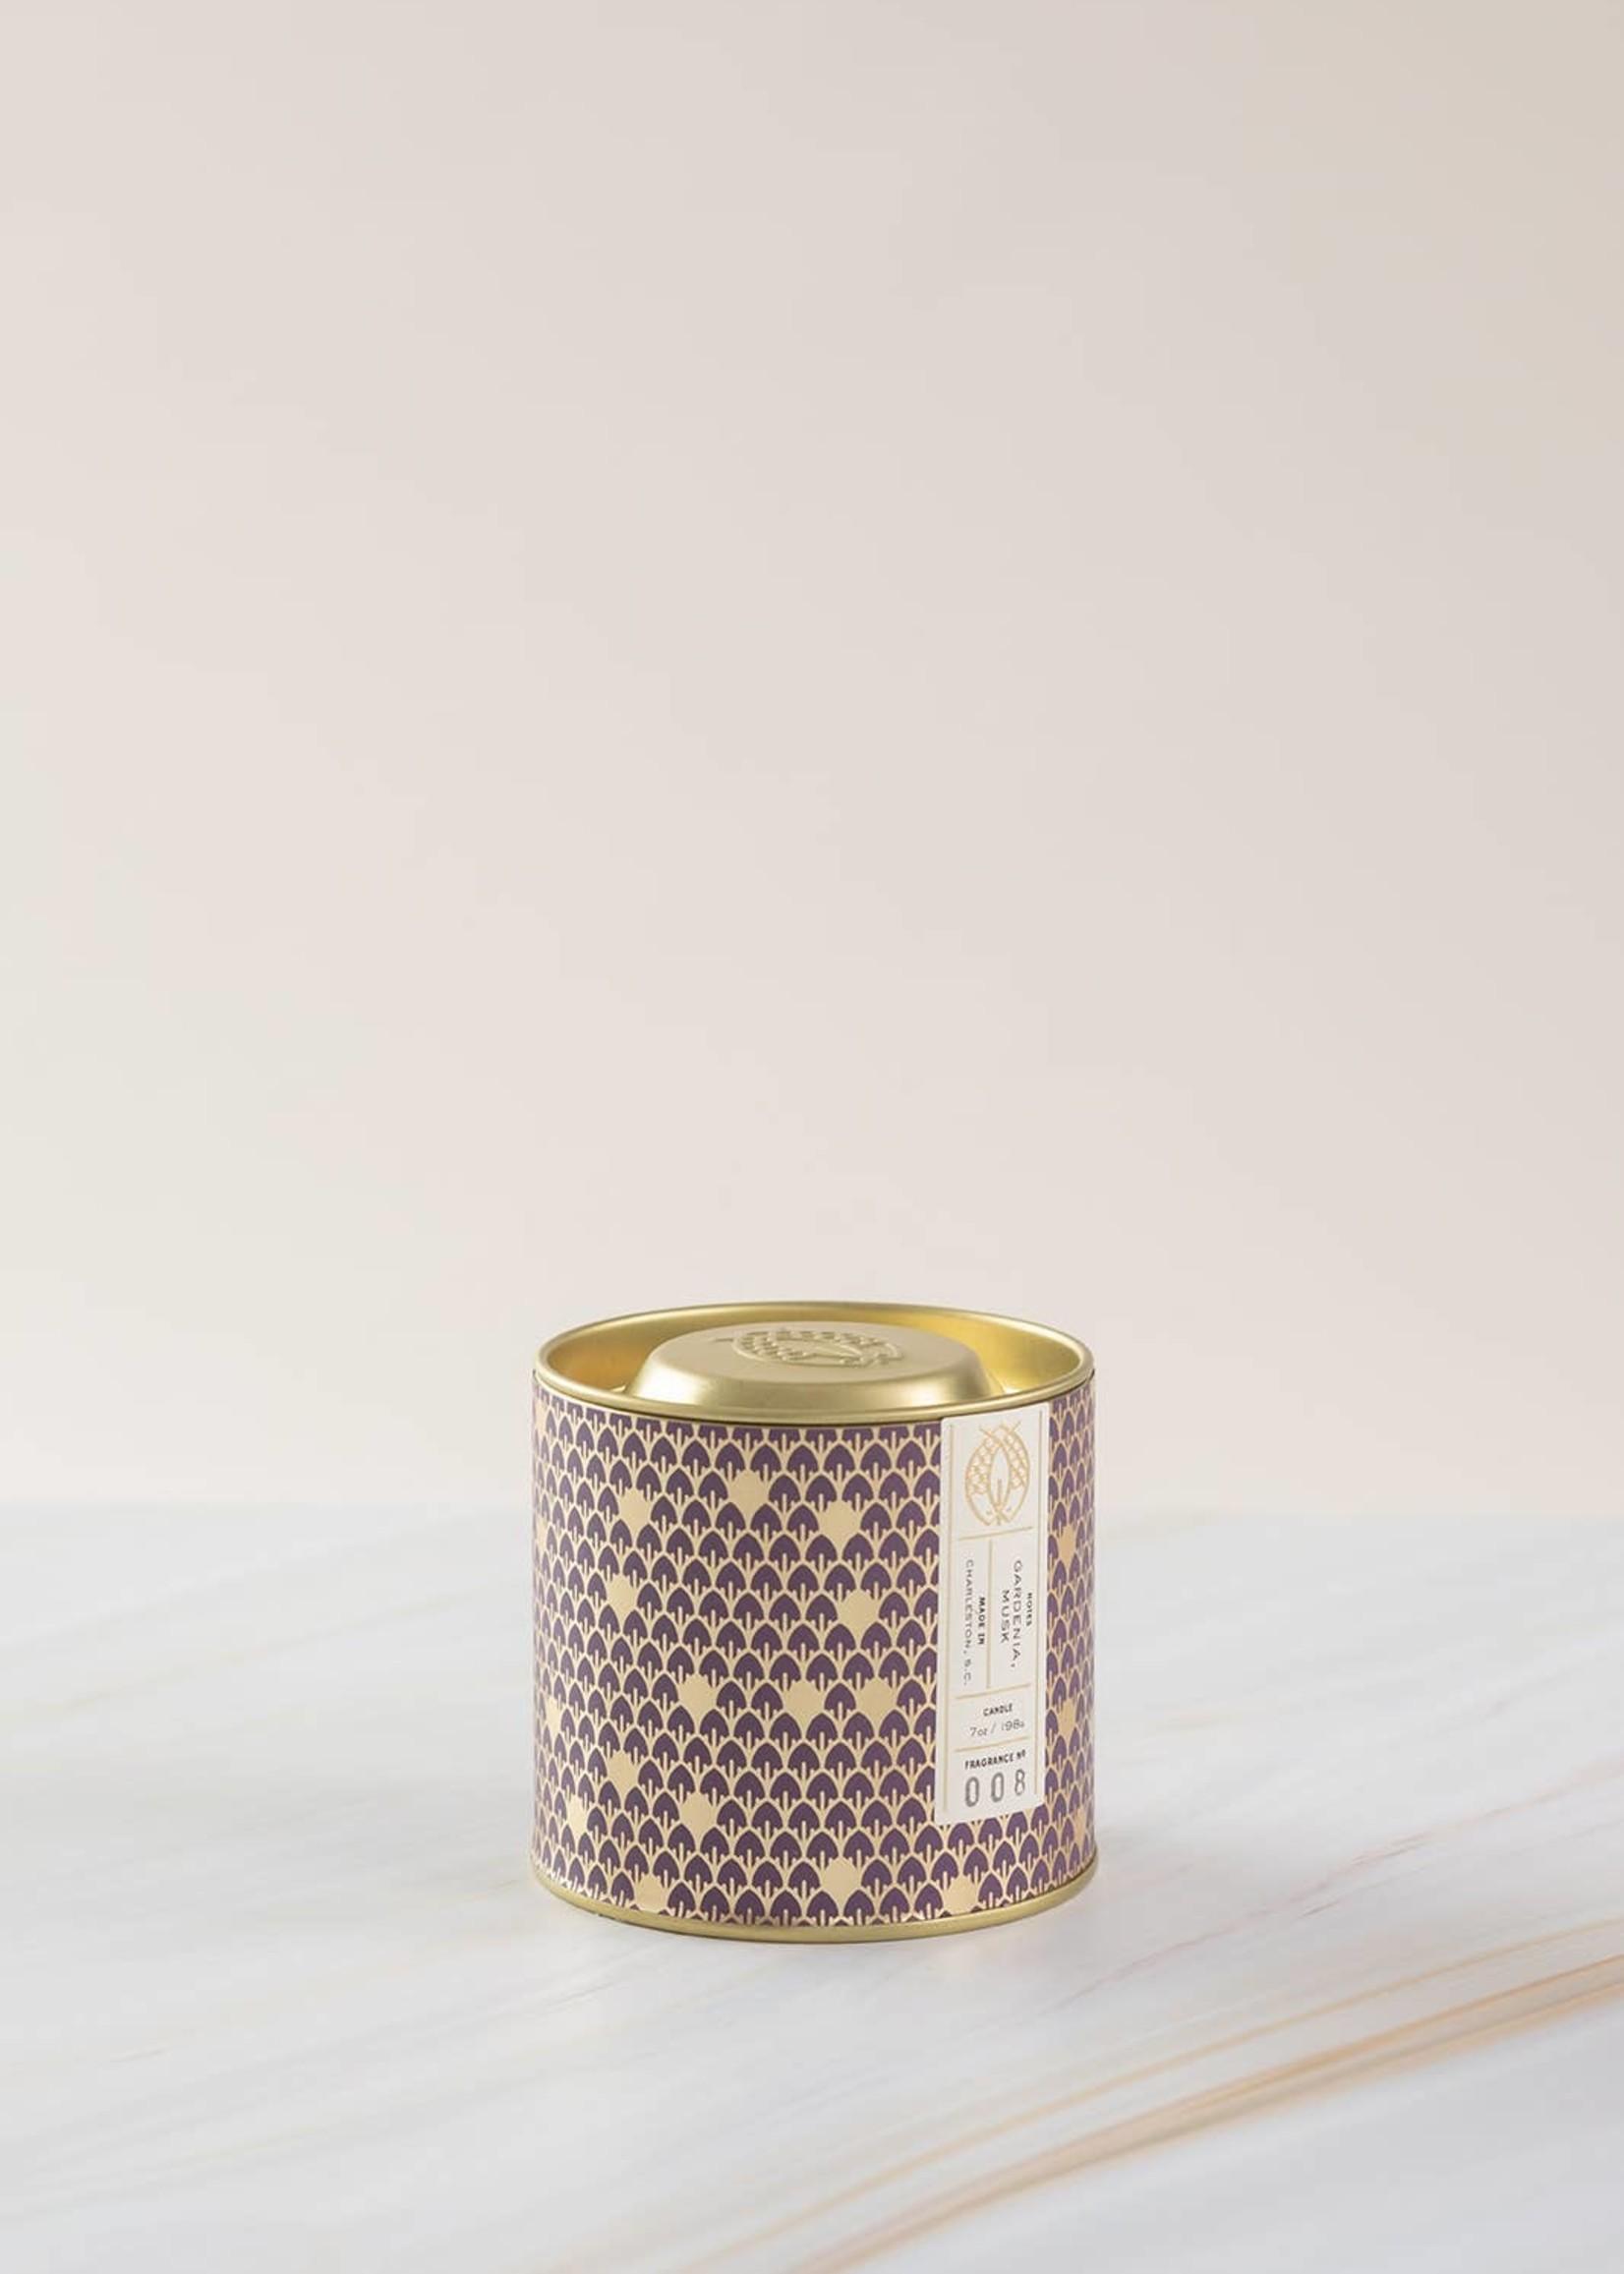 No. 8 Gold Tin w/ Embossed Lid (Purple) 7 oz